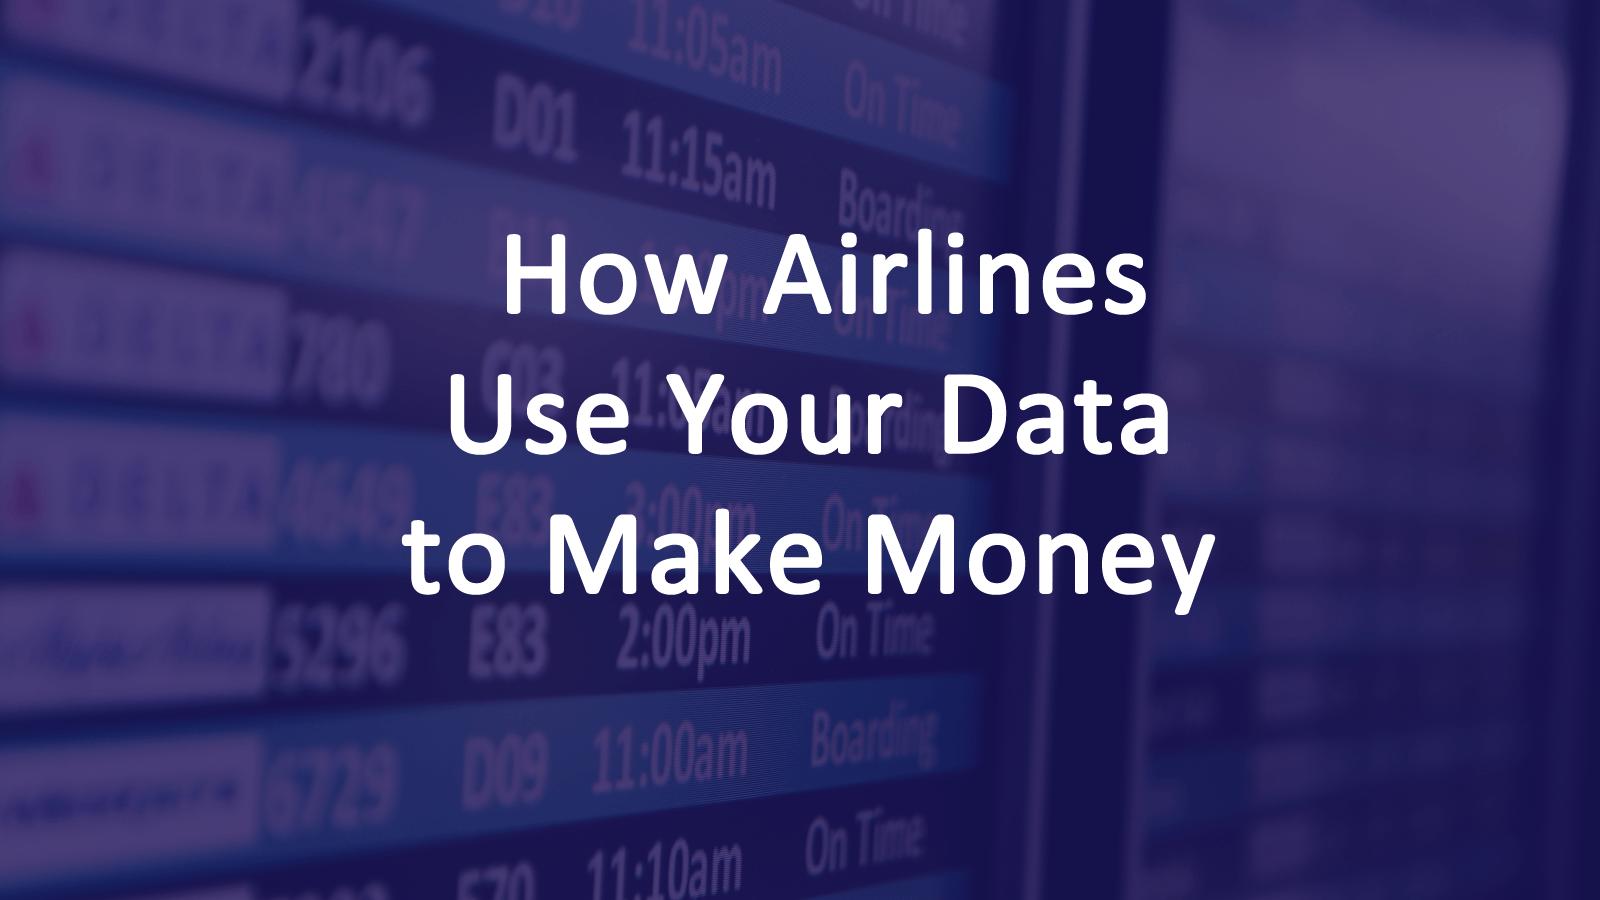 Airlines Use Big Data Make Money